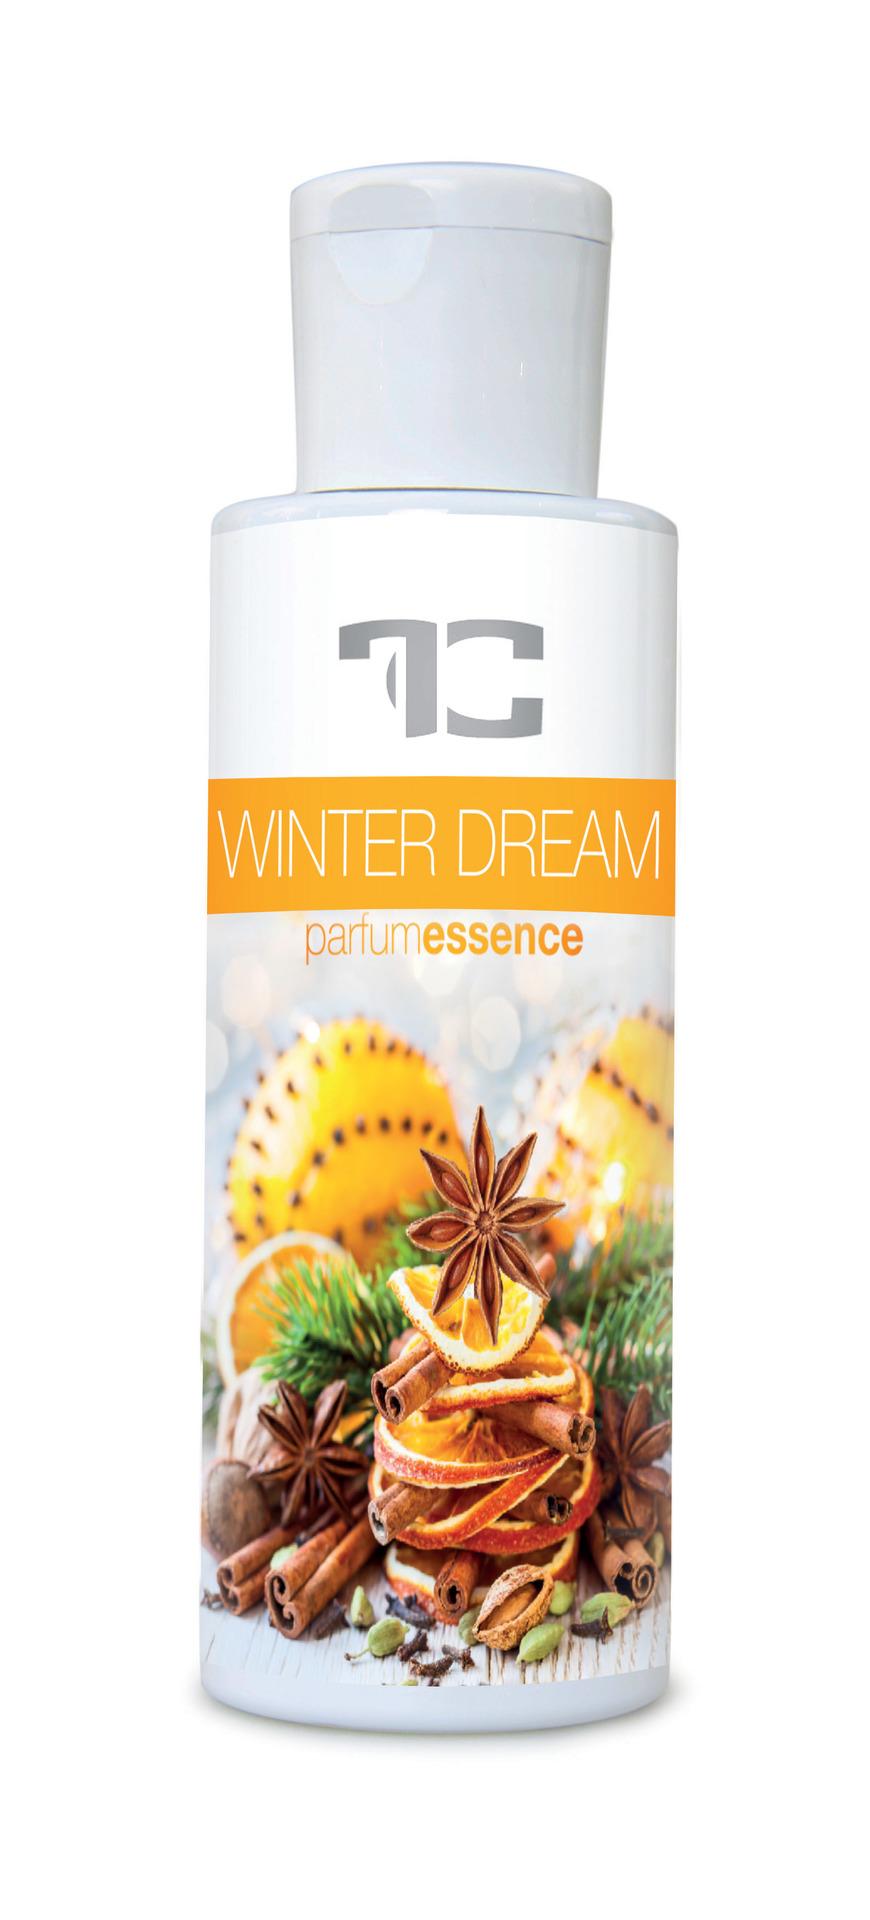 PARFUM ESSENCE, winter dream